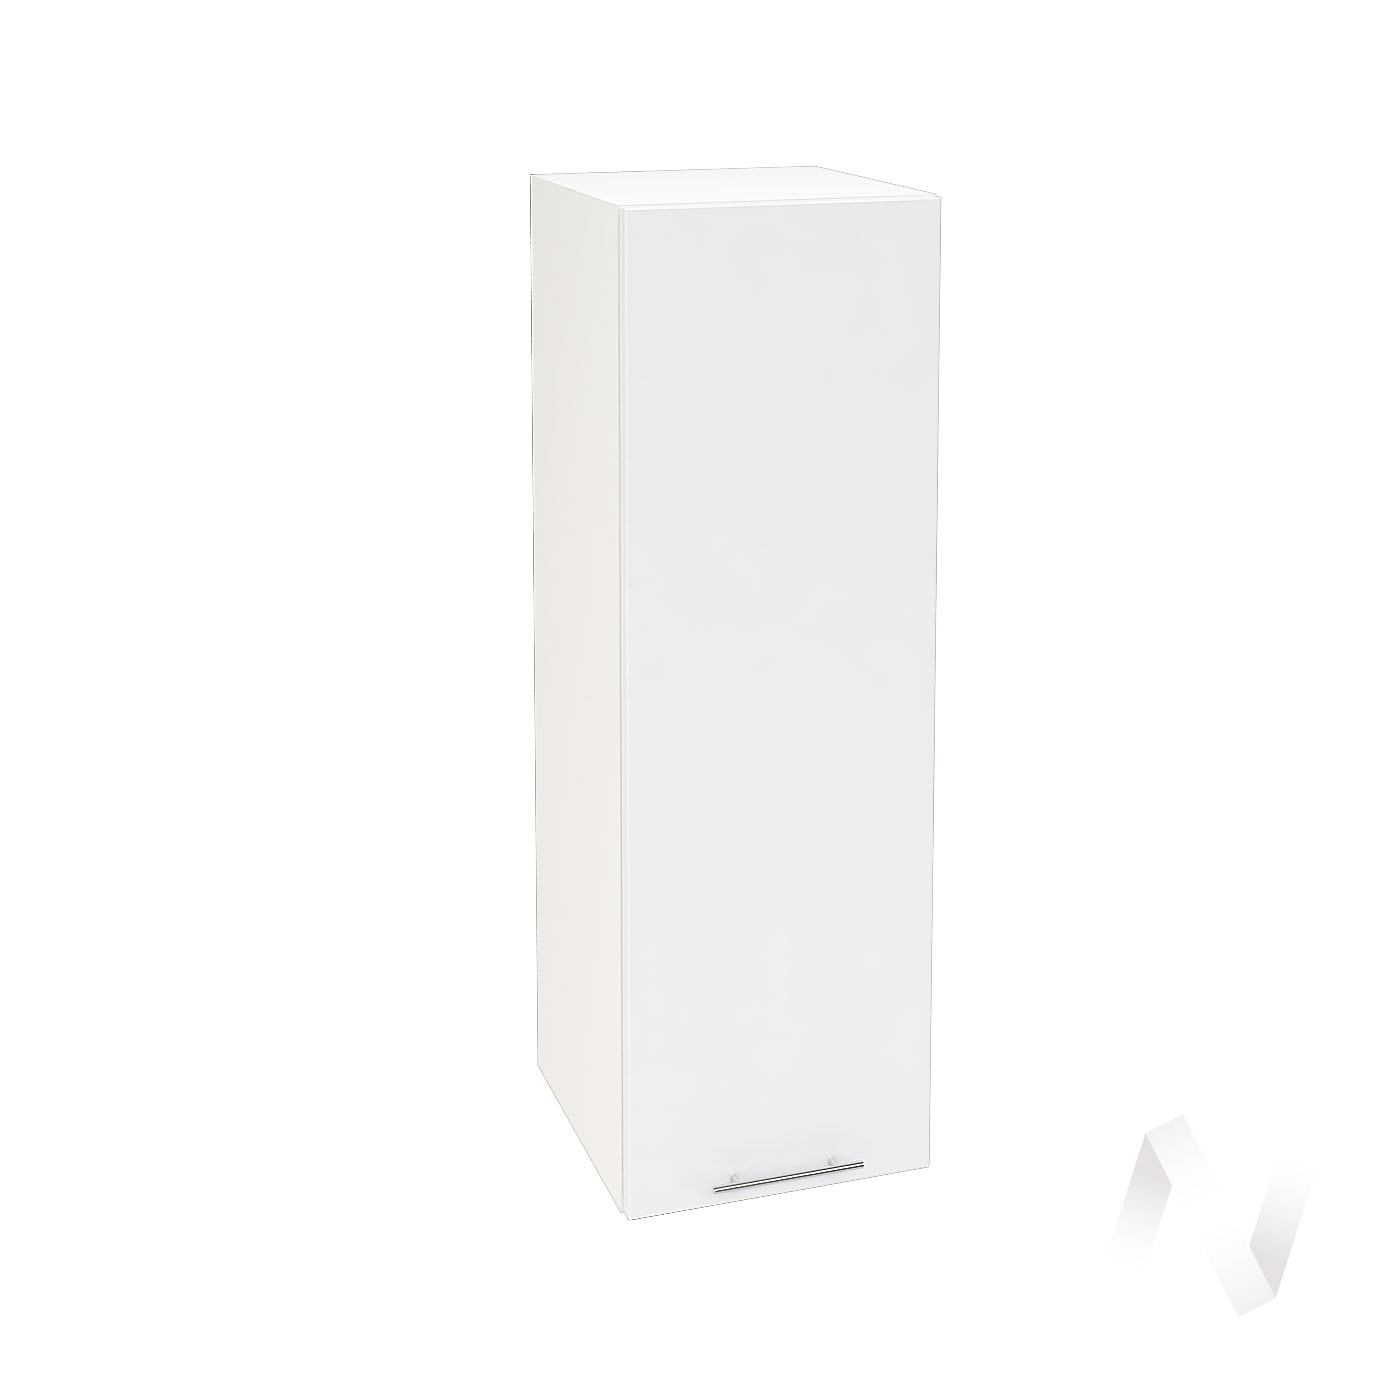 "Кухня ""Валерия-М"": Шкаф верхний 309, ШВ 309 (белый глянец/корпус белый)"